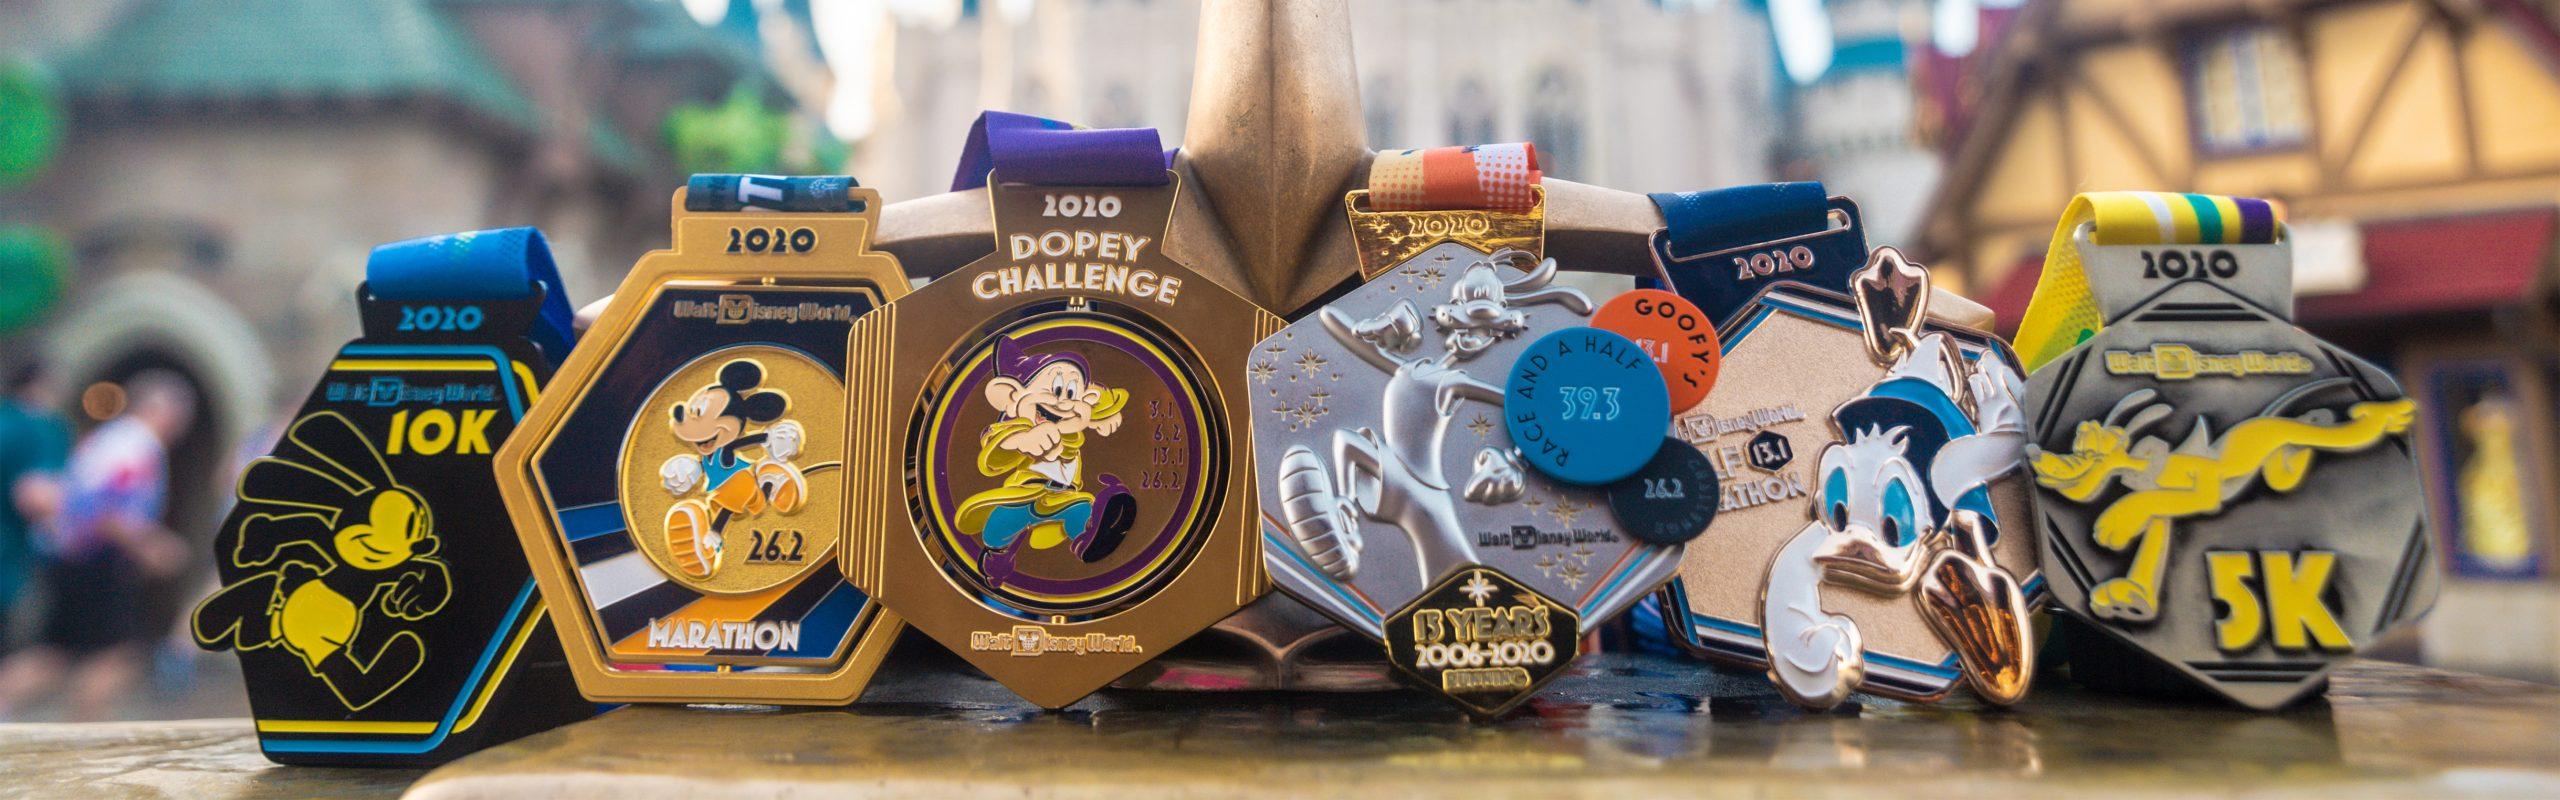 2021 Walt Disney World Marathon Registration Pushed Back